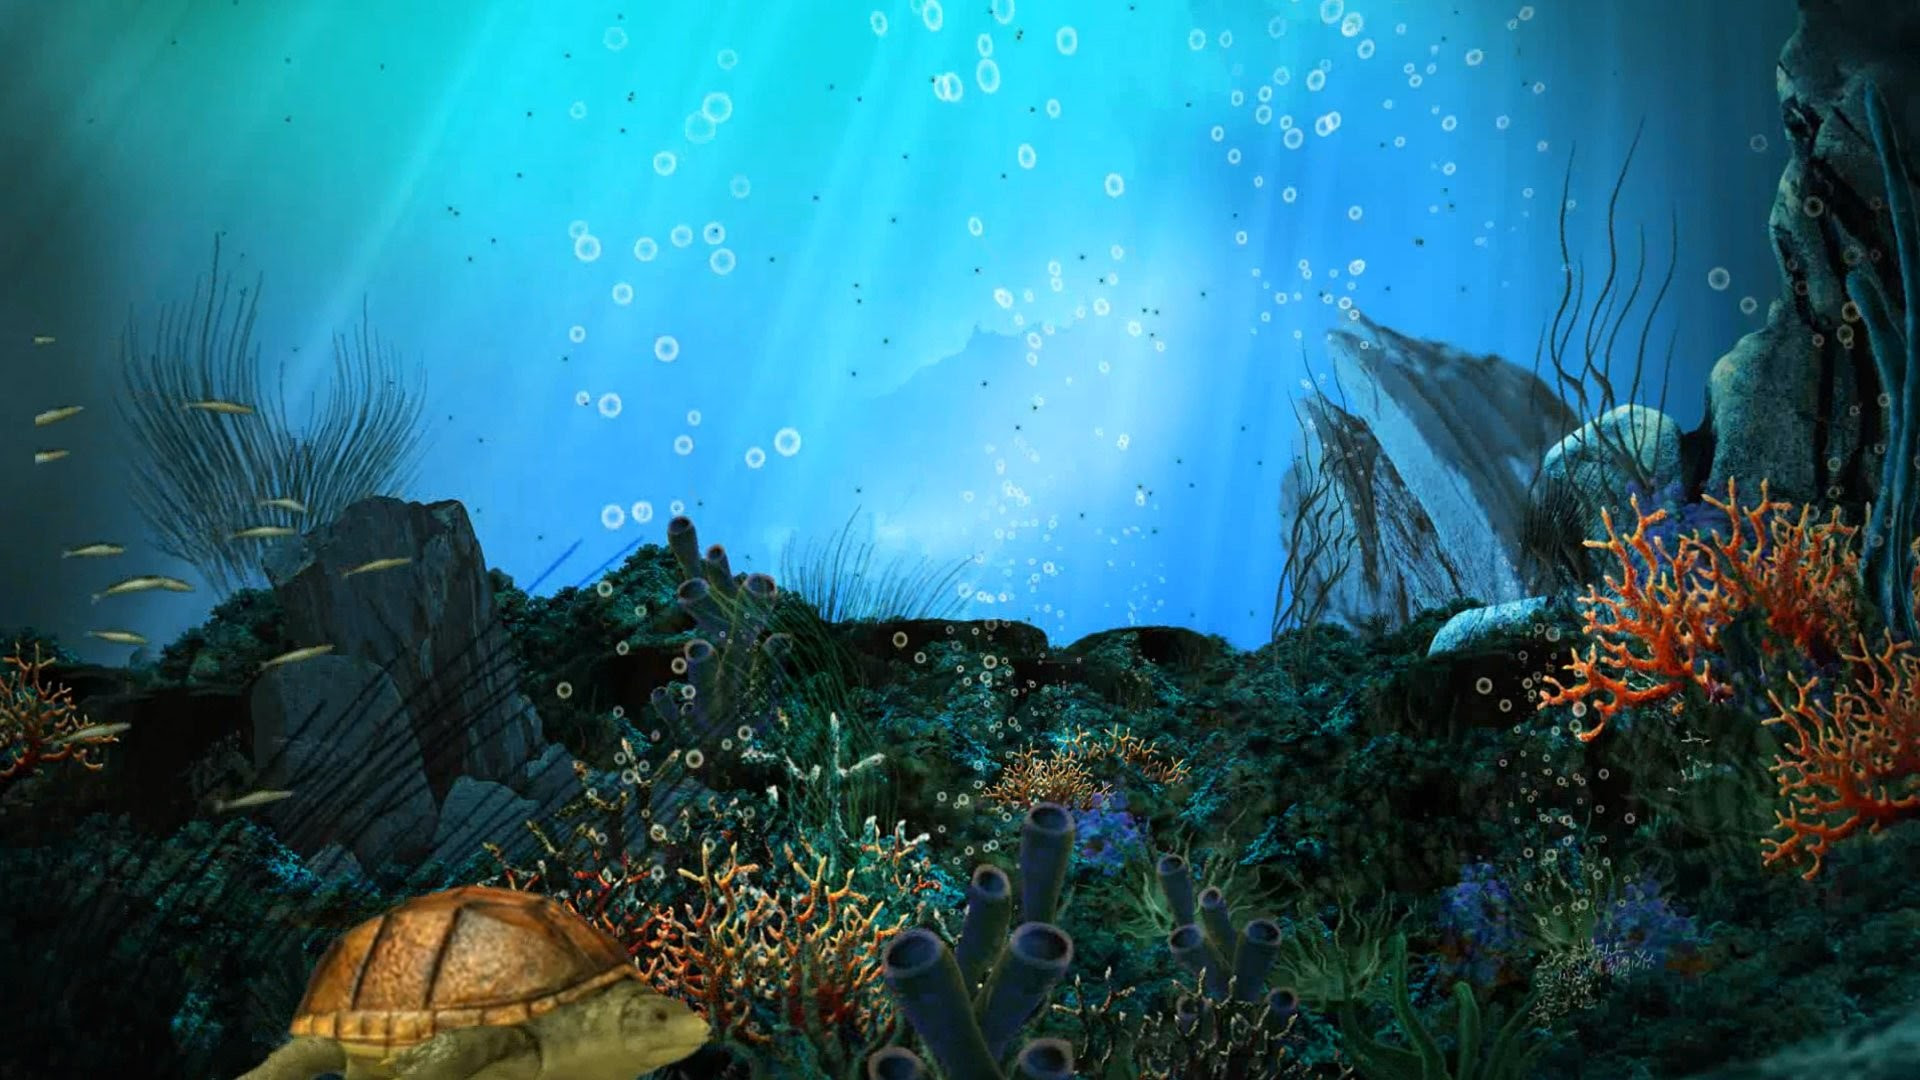 Unduh 80 Wallpaper Animasi Bergerak 4k HD Terbaik